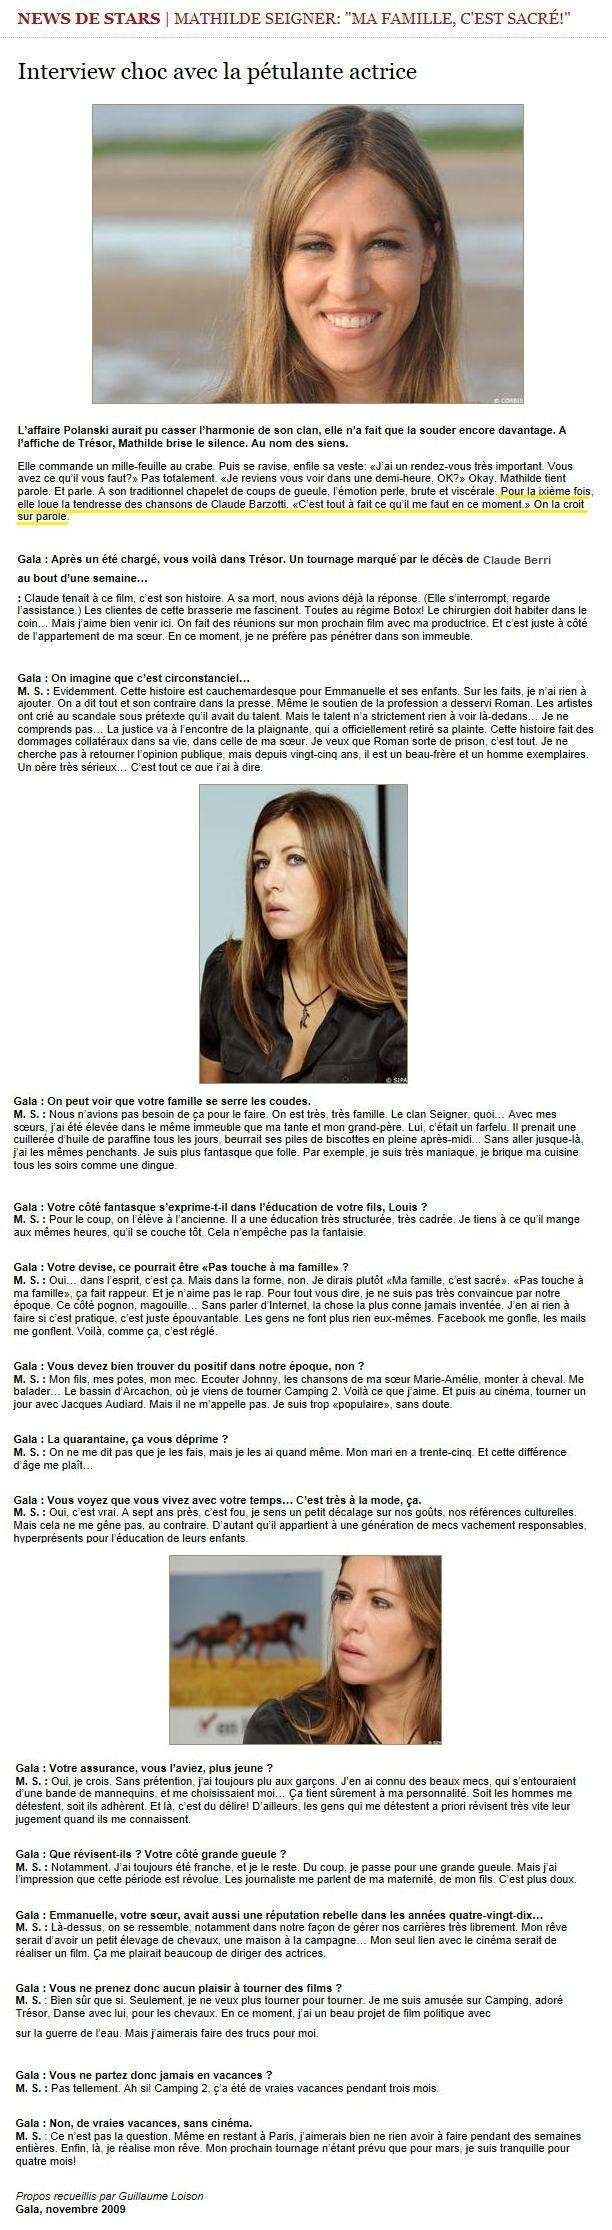 interview de Gala 2009